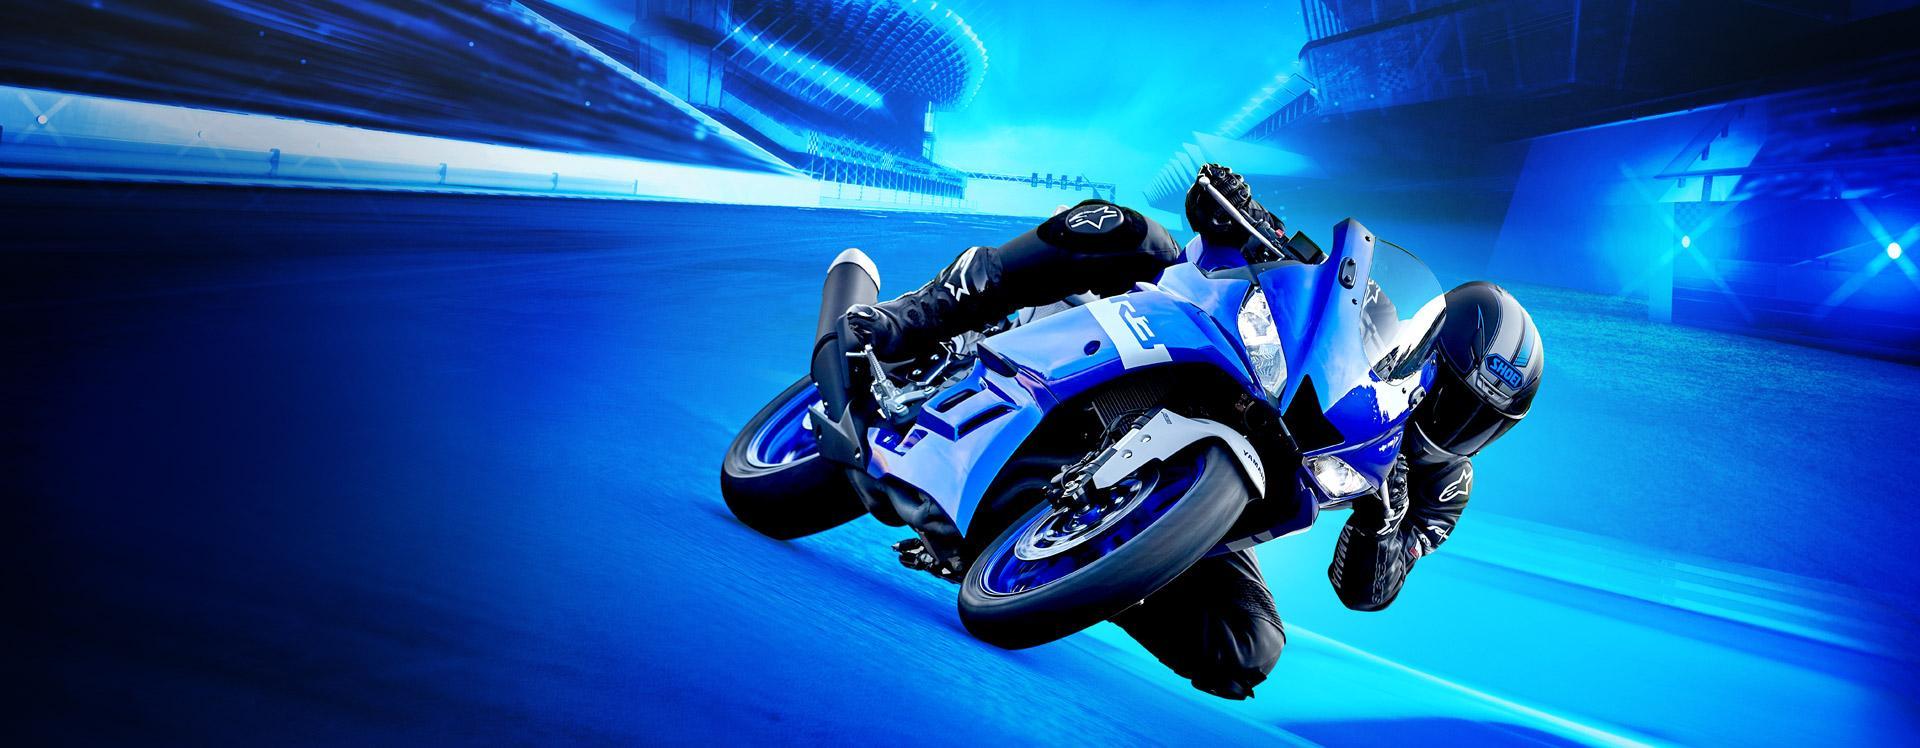 Japan Motorcycle Export